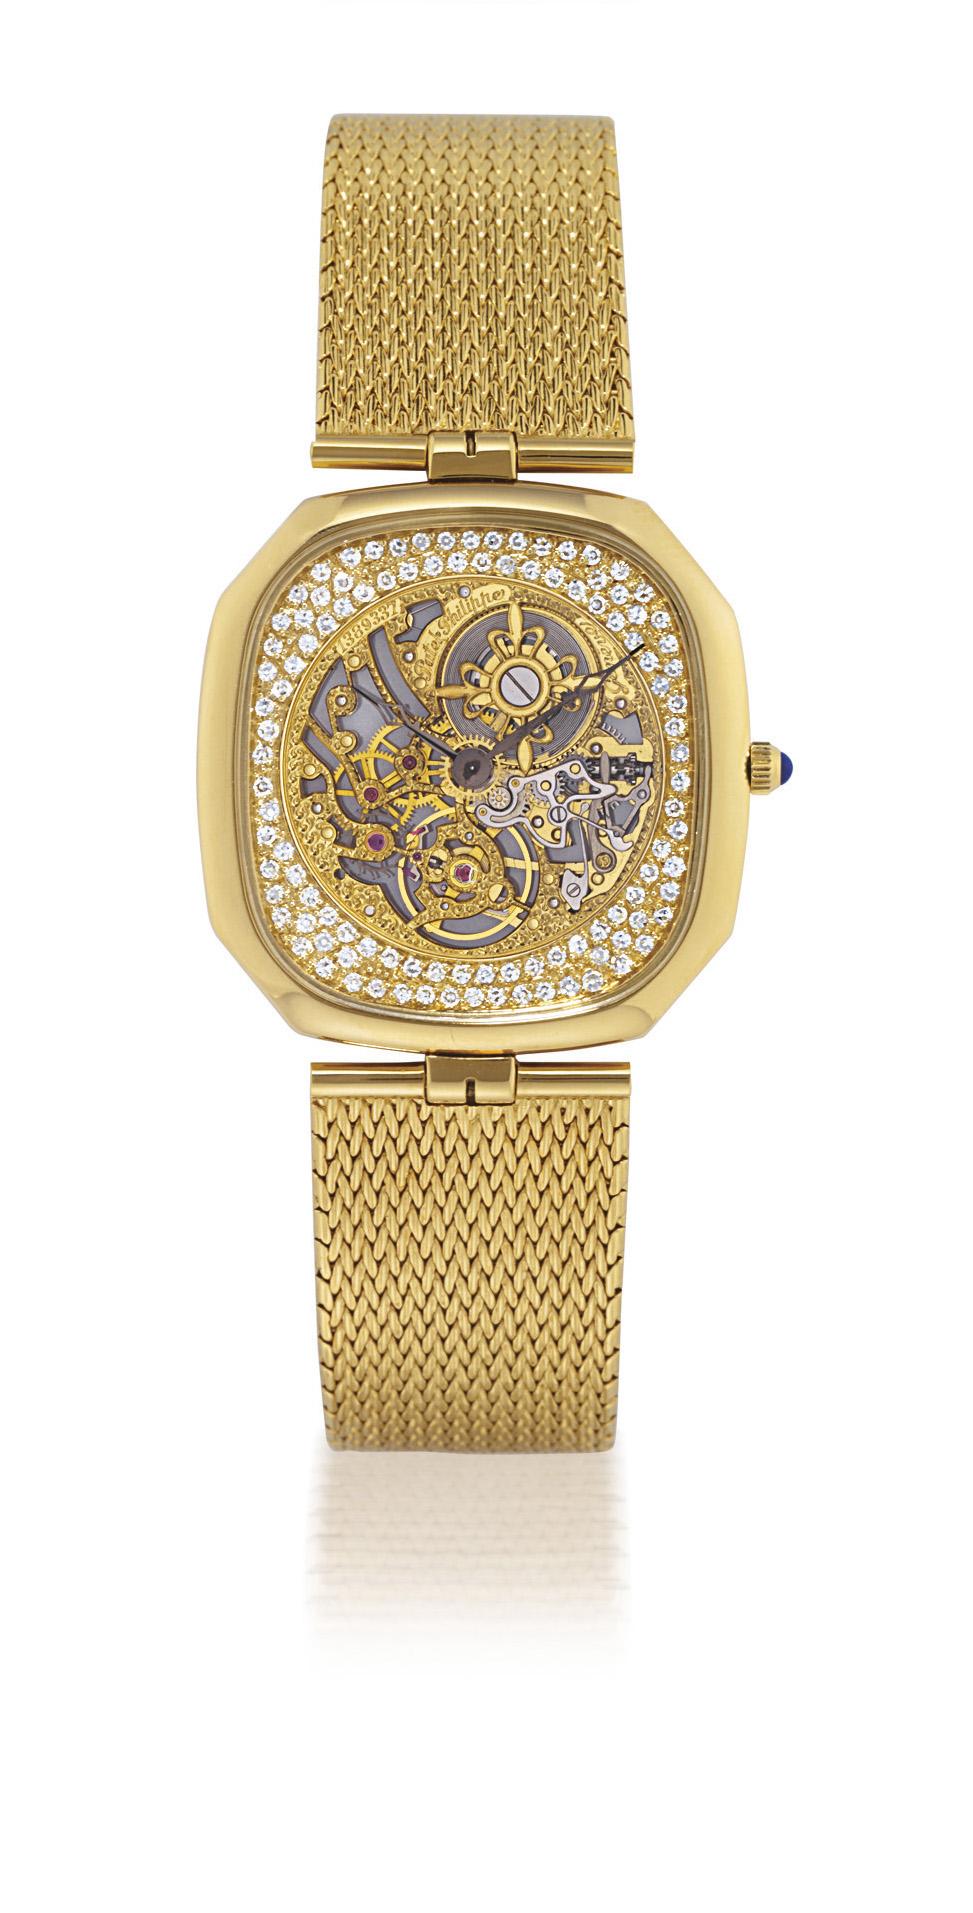 PATEK PHILIPPE, REF. 3887  YELLOW GOLD AND DIAMOND-SET MANUALLY-WOUND SKELETONISED BRACELET WATCH